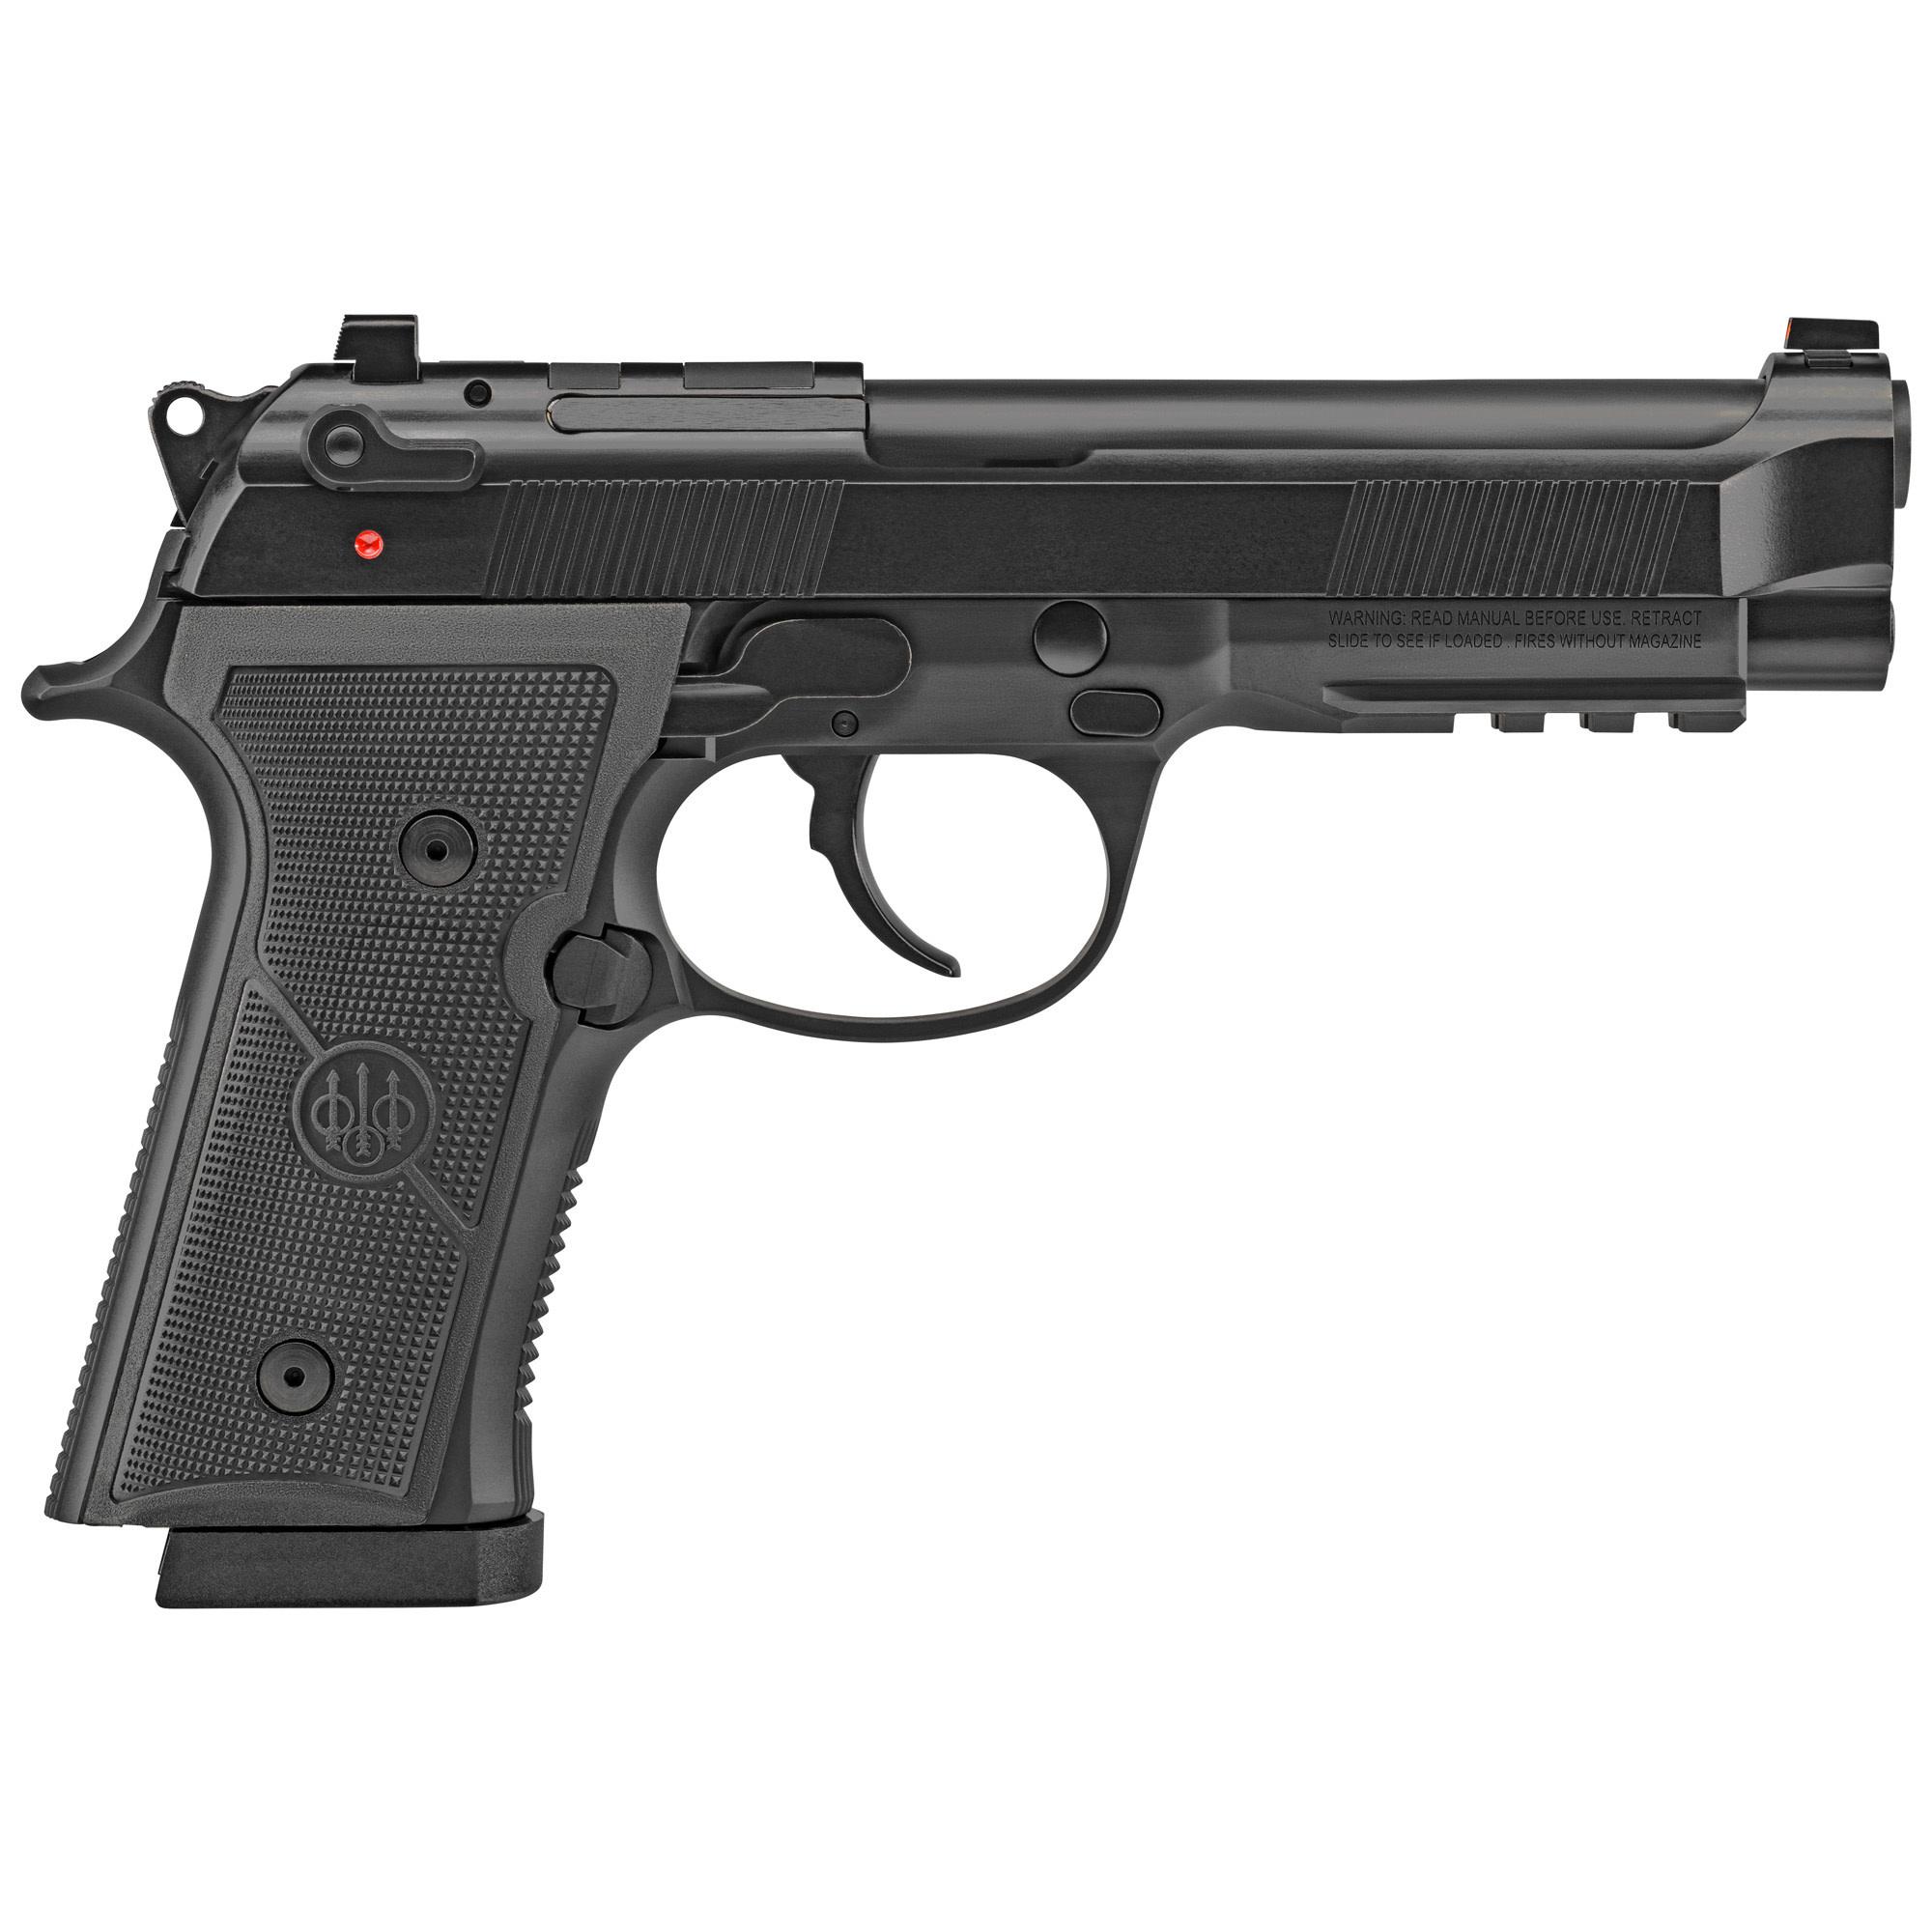 "Beretta 92X RDO Optics Ready, Black, DA/SA, 9mm, 4.7"" Barrel, Manual Safety/Decocker, 18 Rounds, 2 Magazines"